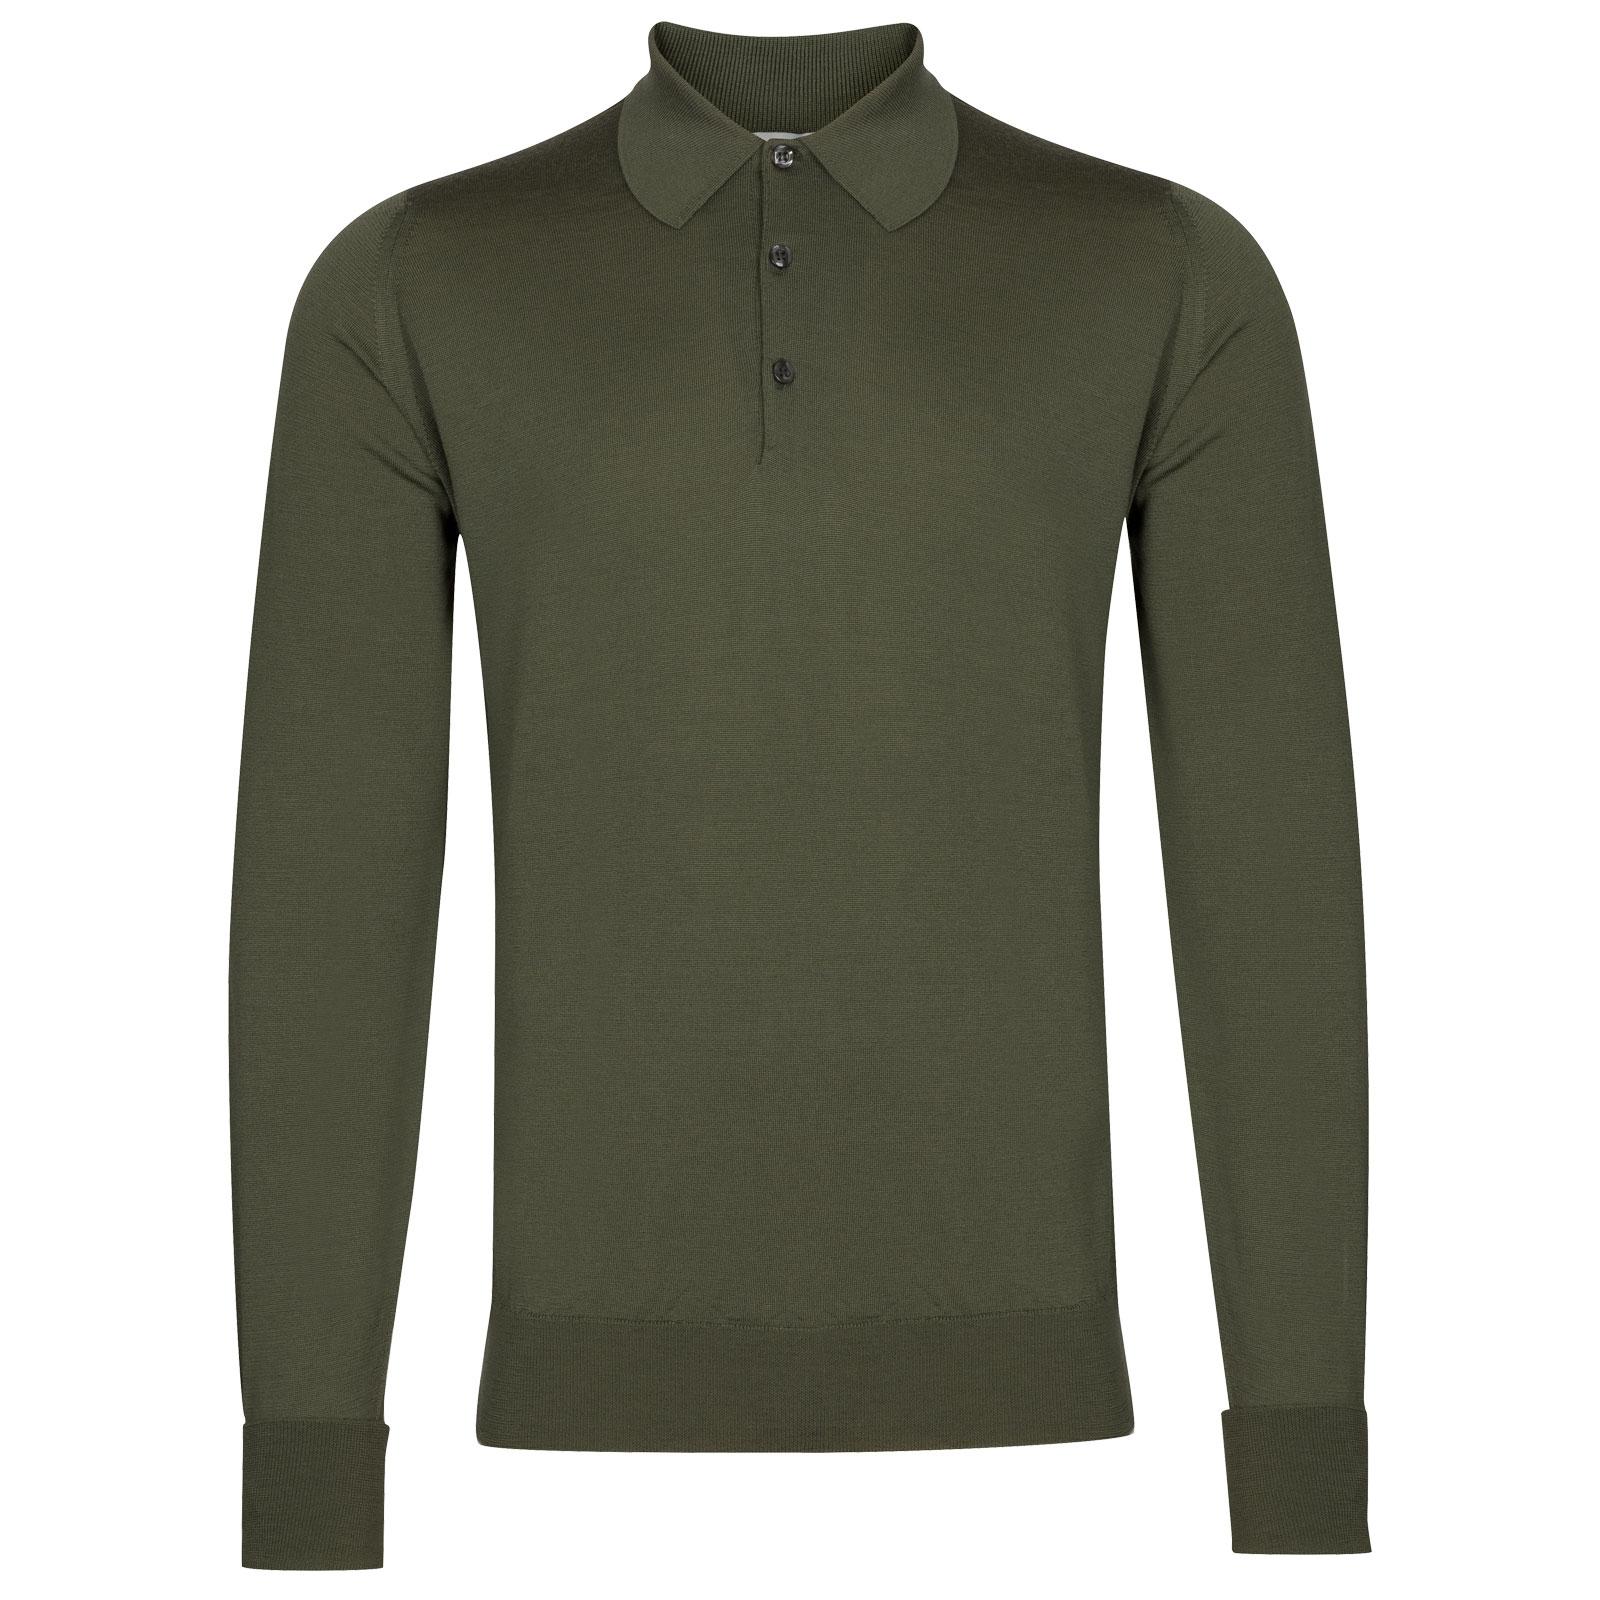 John Smedley Dorset in Sepal Green Shirt-XLG